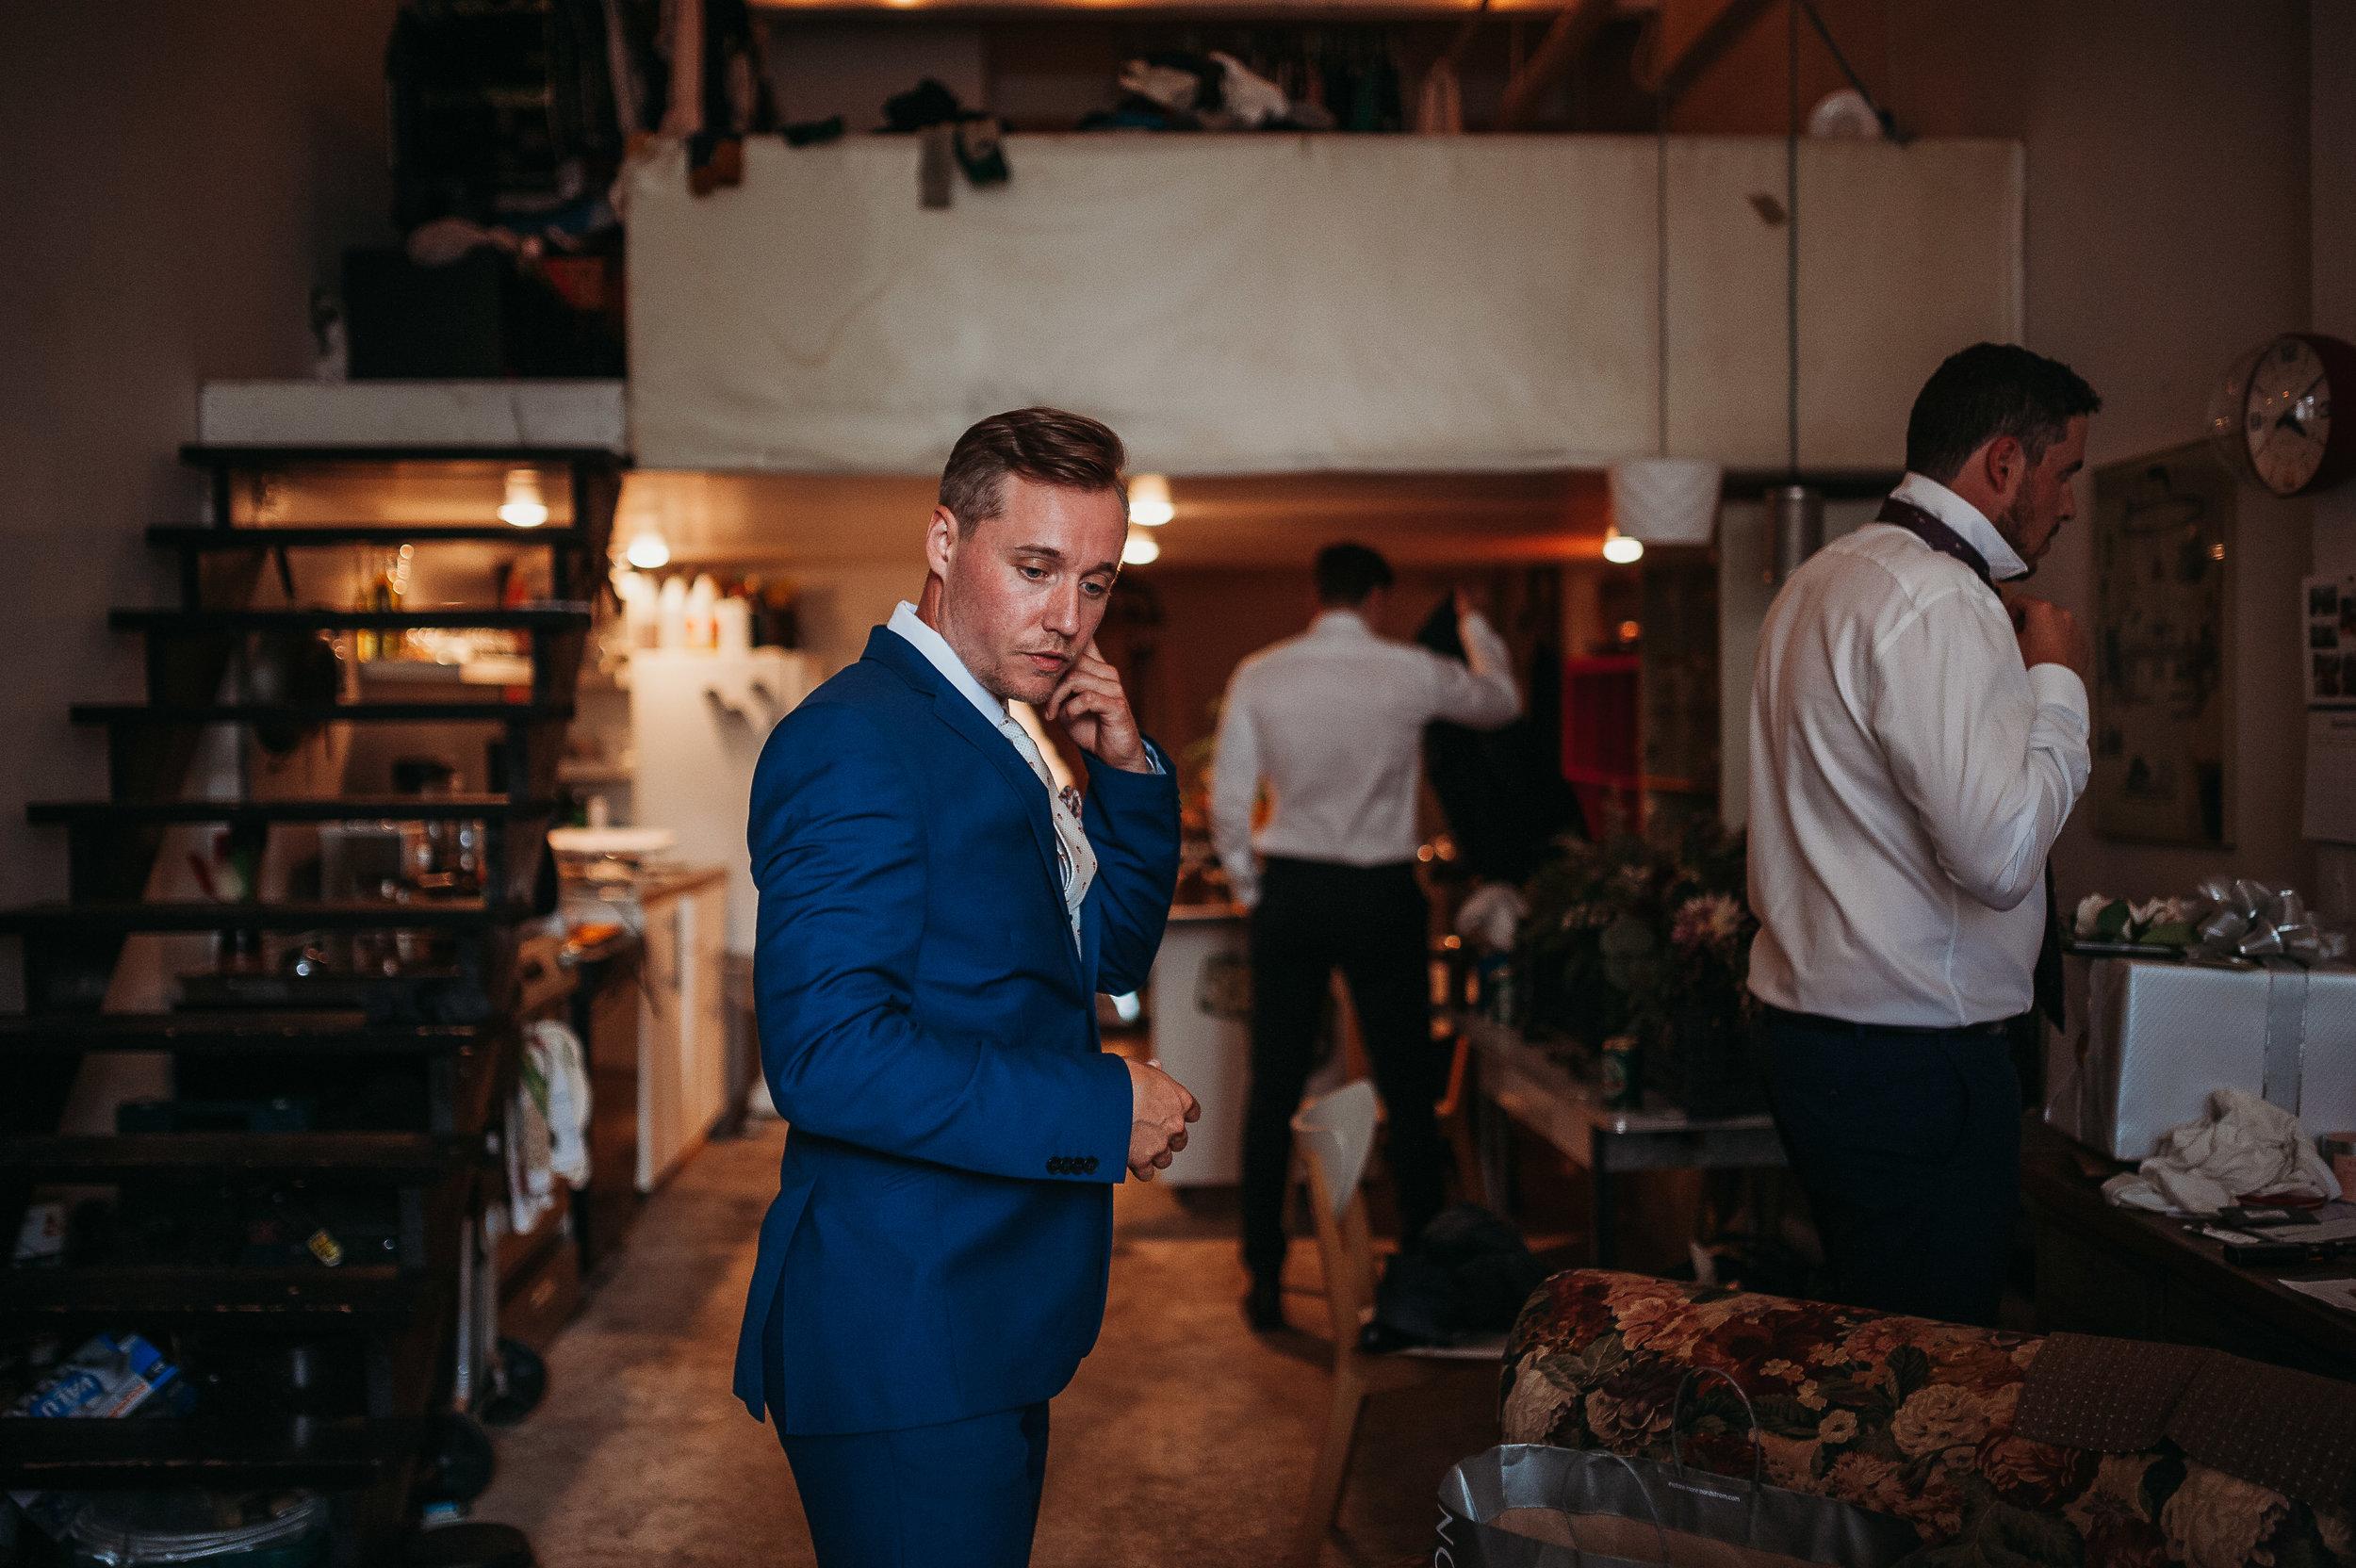 groom-getting-ready-pictures-groom-toronto-rustic-boho-airship37-wedding-by-willow-birch-photo-toronto-documentary-wedding-photographers.jpg